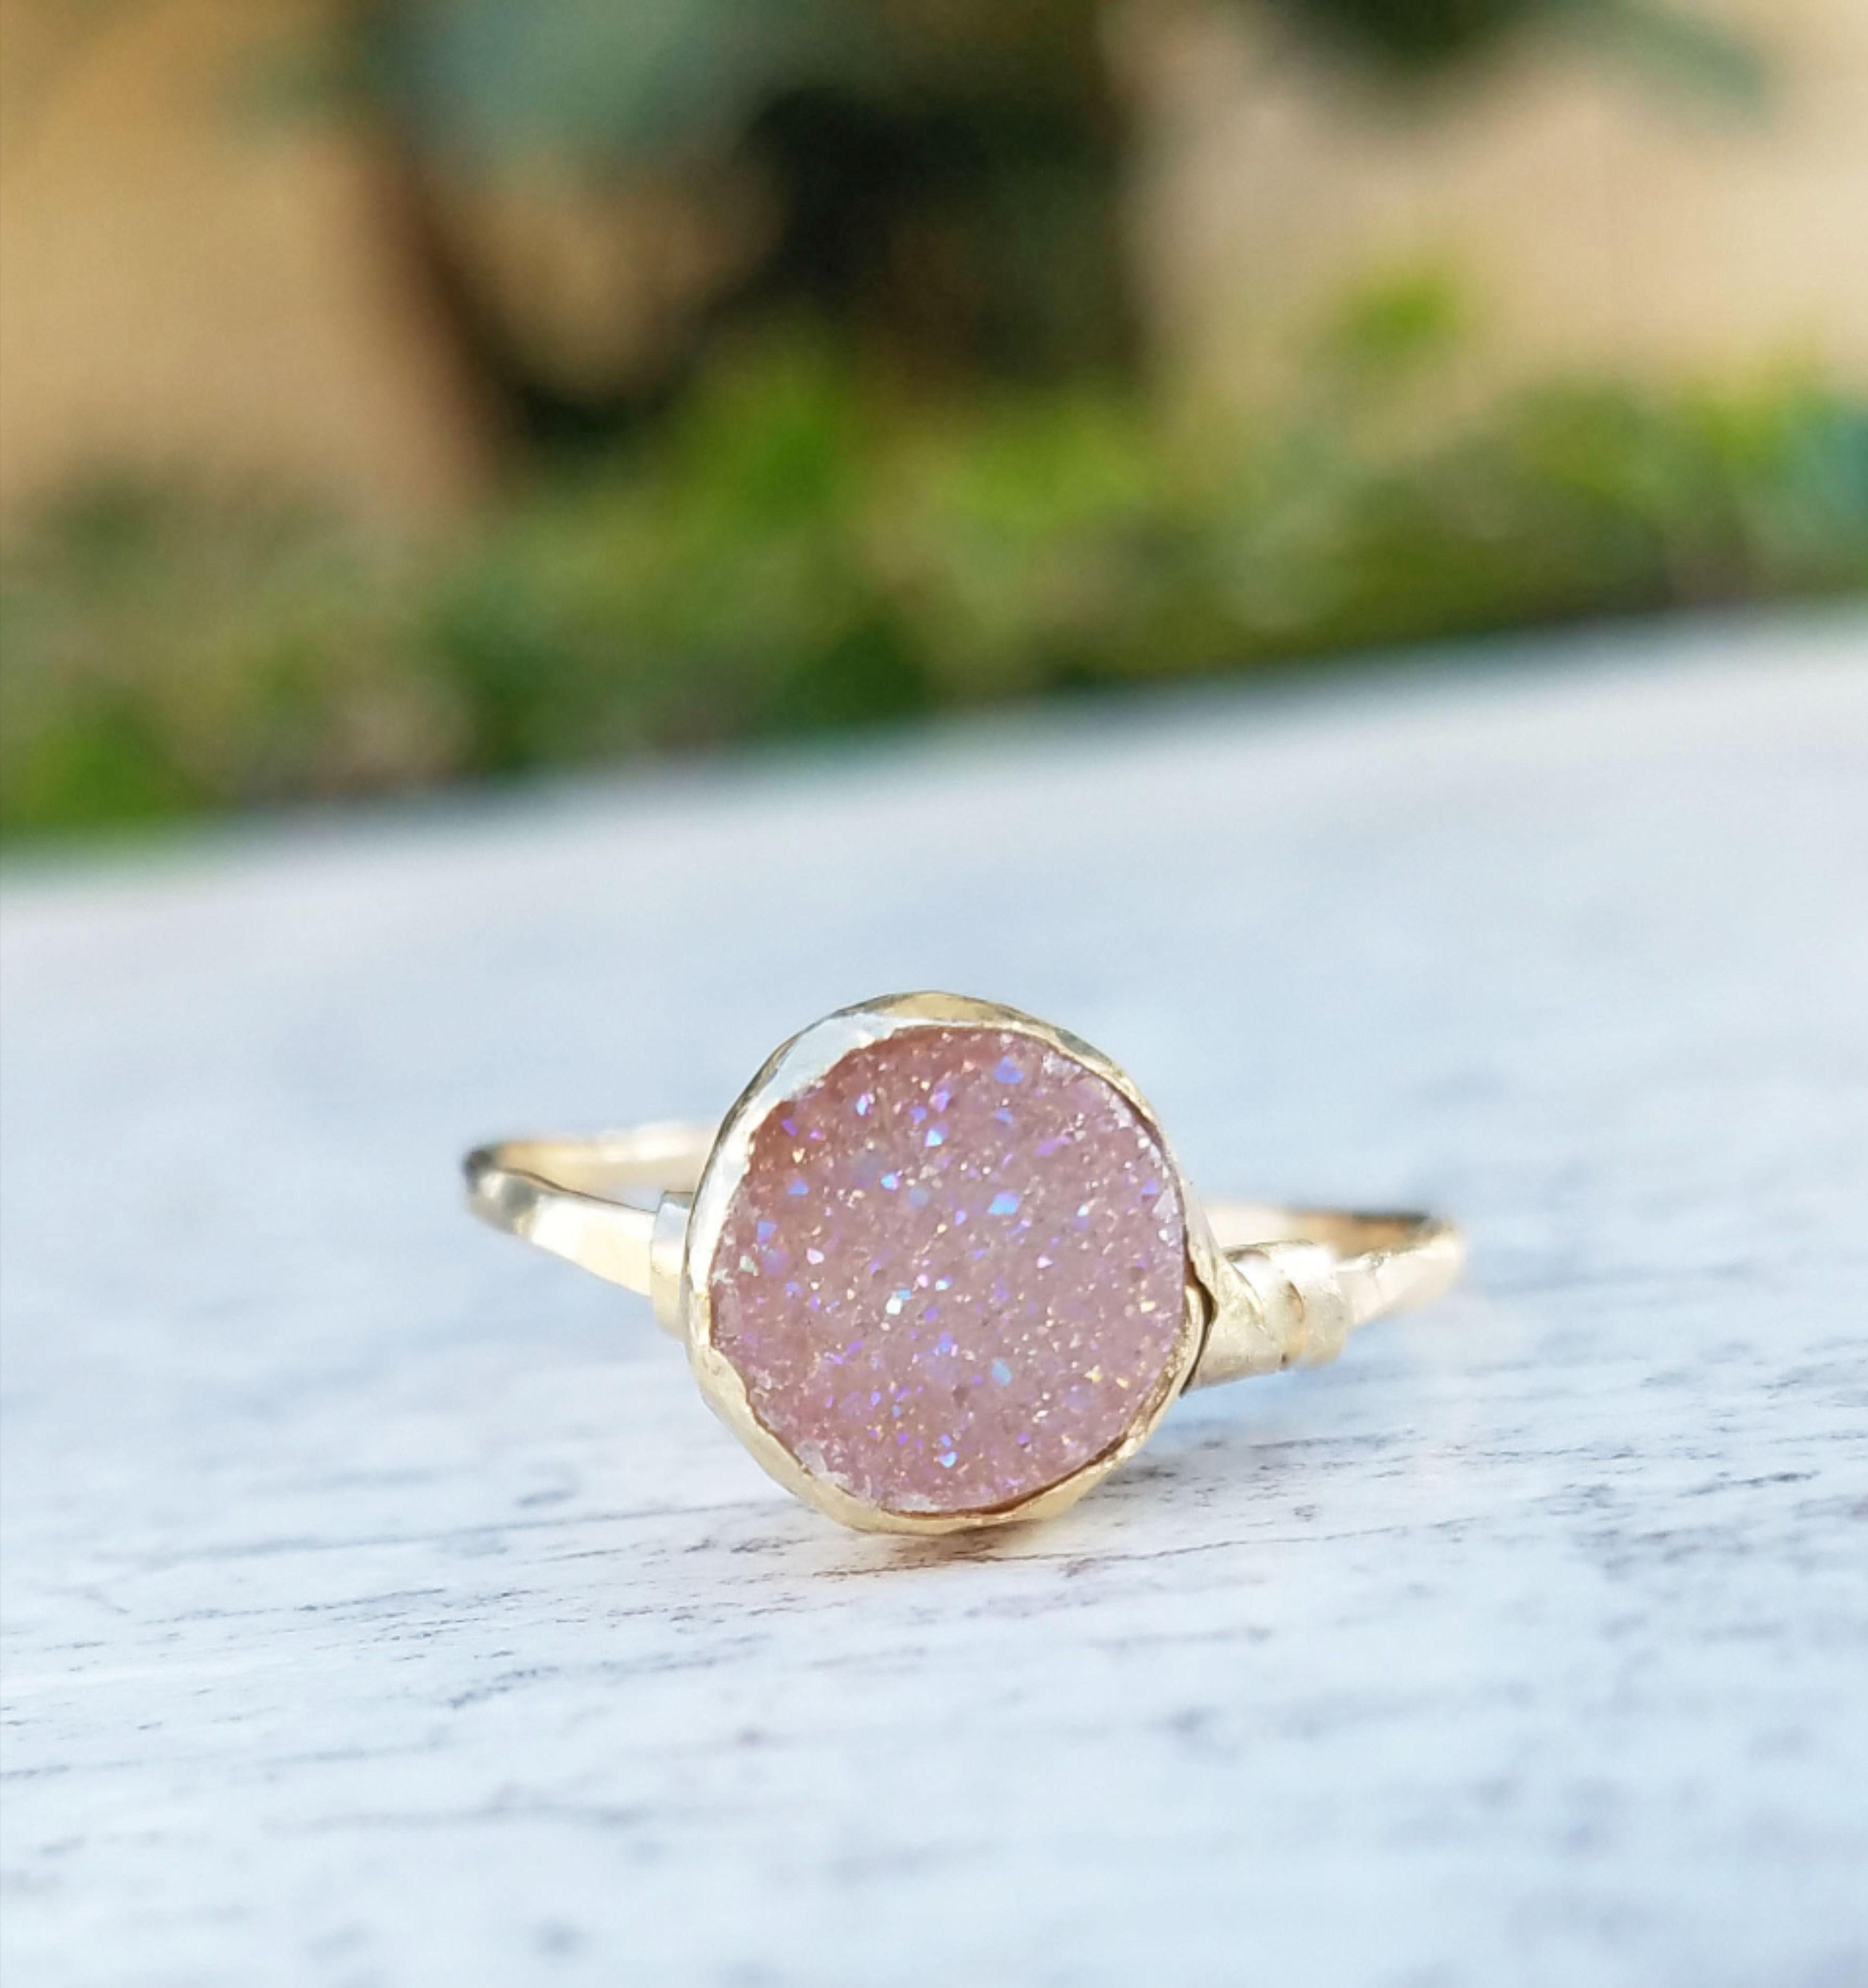 Beautiful Women/'s Ring |Feminine Rings 14k Yellow Gold Plated Ring Natural Stone Ring Large  Druzy Quartz Ring Cute Girl/'s Ring